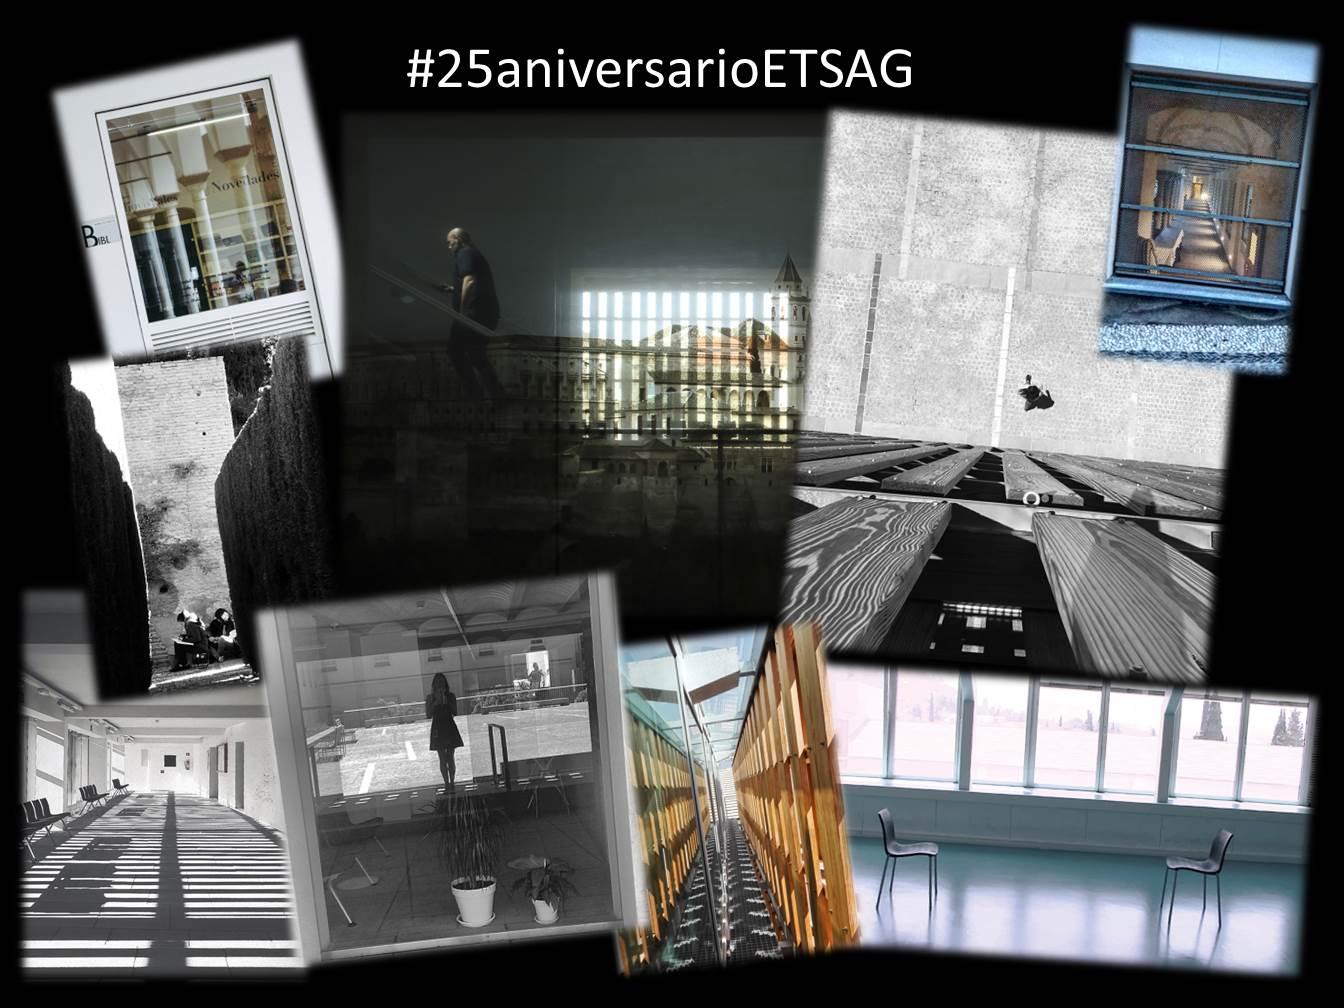 #25aniversarioETSAG